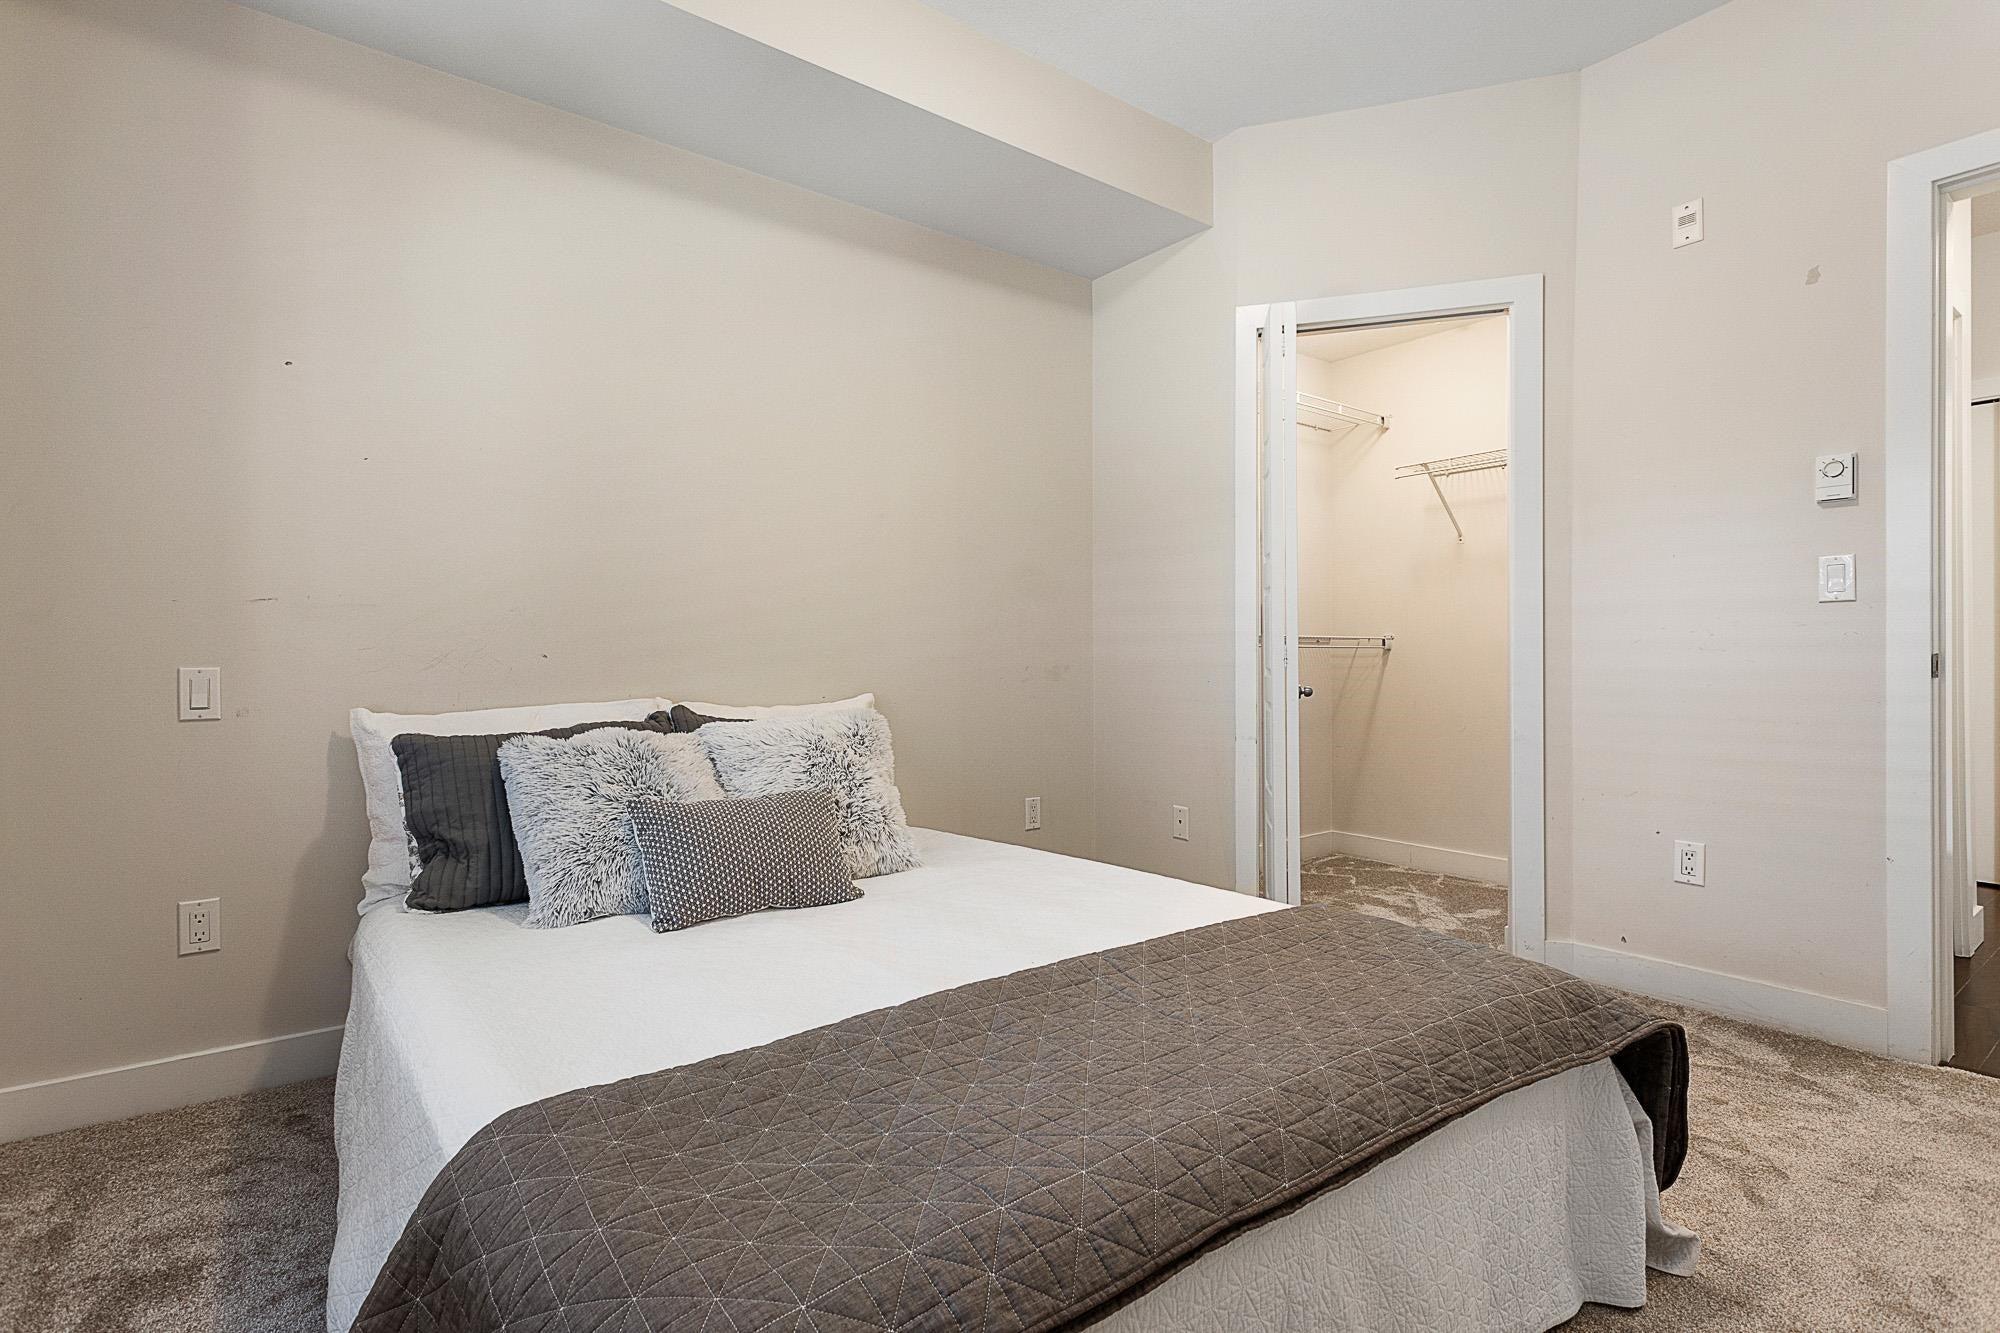 114 20219 54A AVENUE - Langley City Apartment/Condo for sale, 1 Bedroom (R2616172) - #19